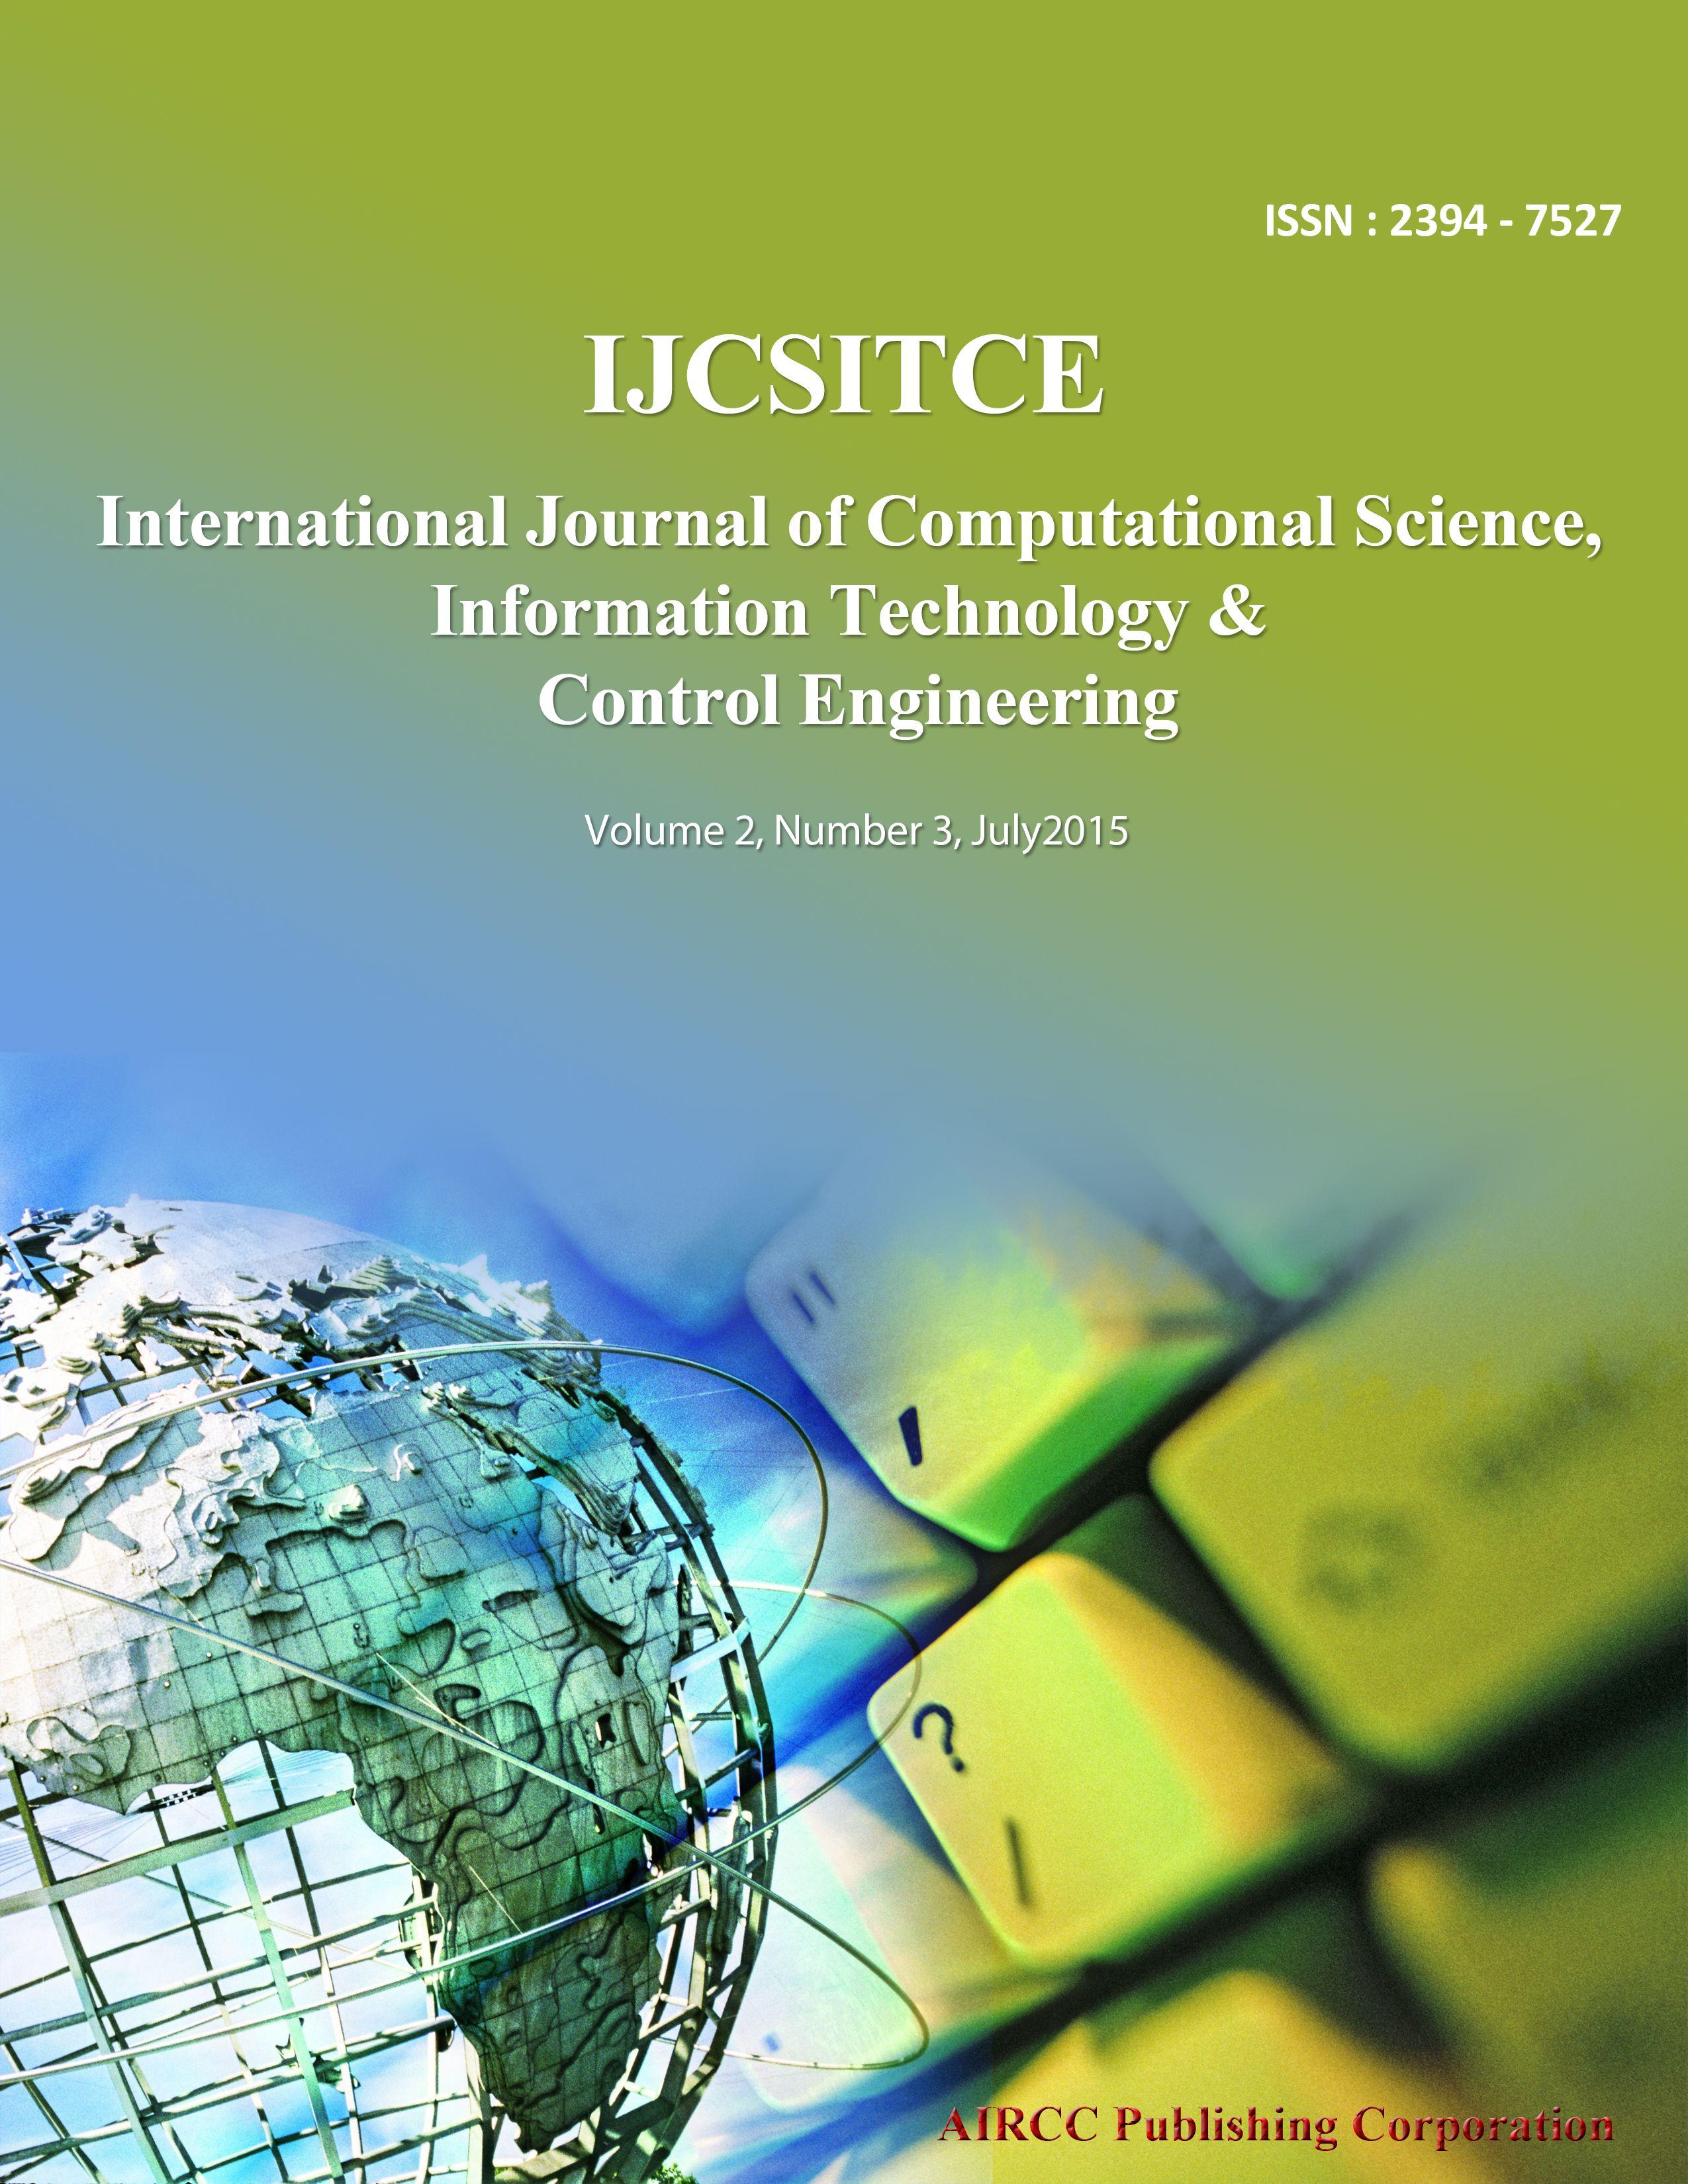 The International Journal of Computational Science